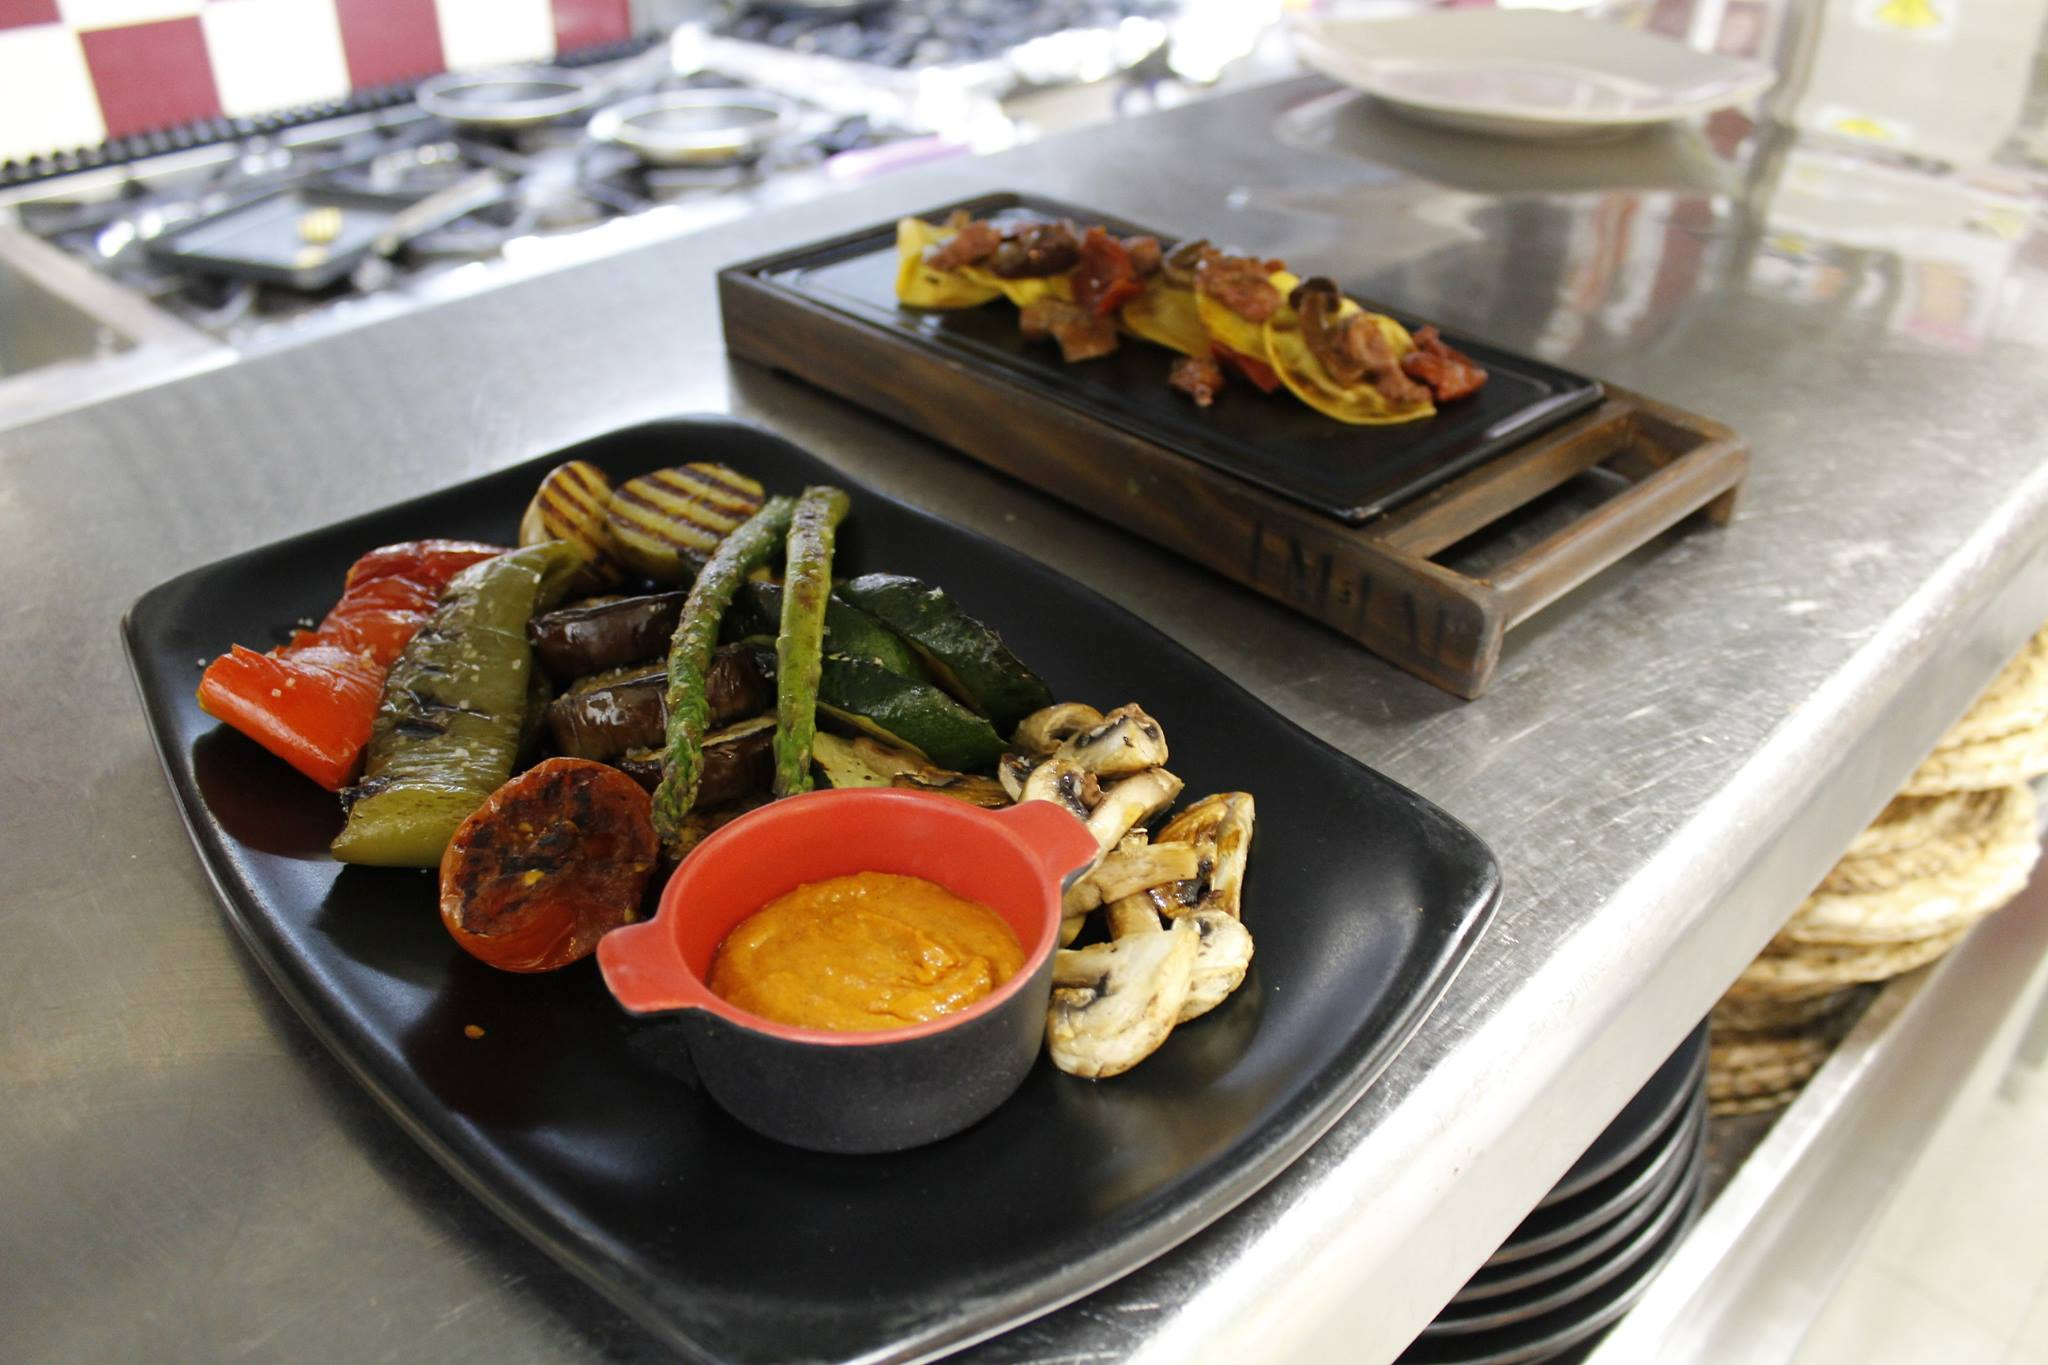 Detalles que indican que estás en un restaurante con comida saludable 0 - Detalles que indican que estás en un restaurante con opciones saludables